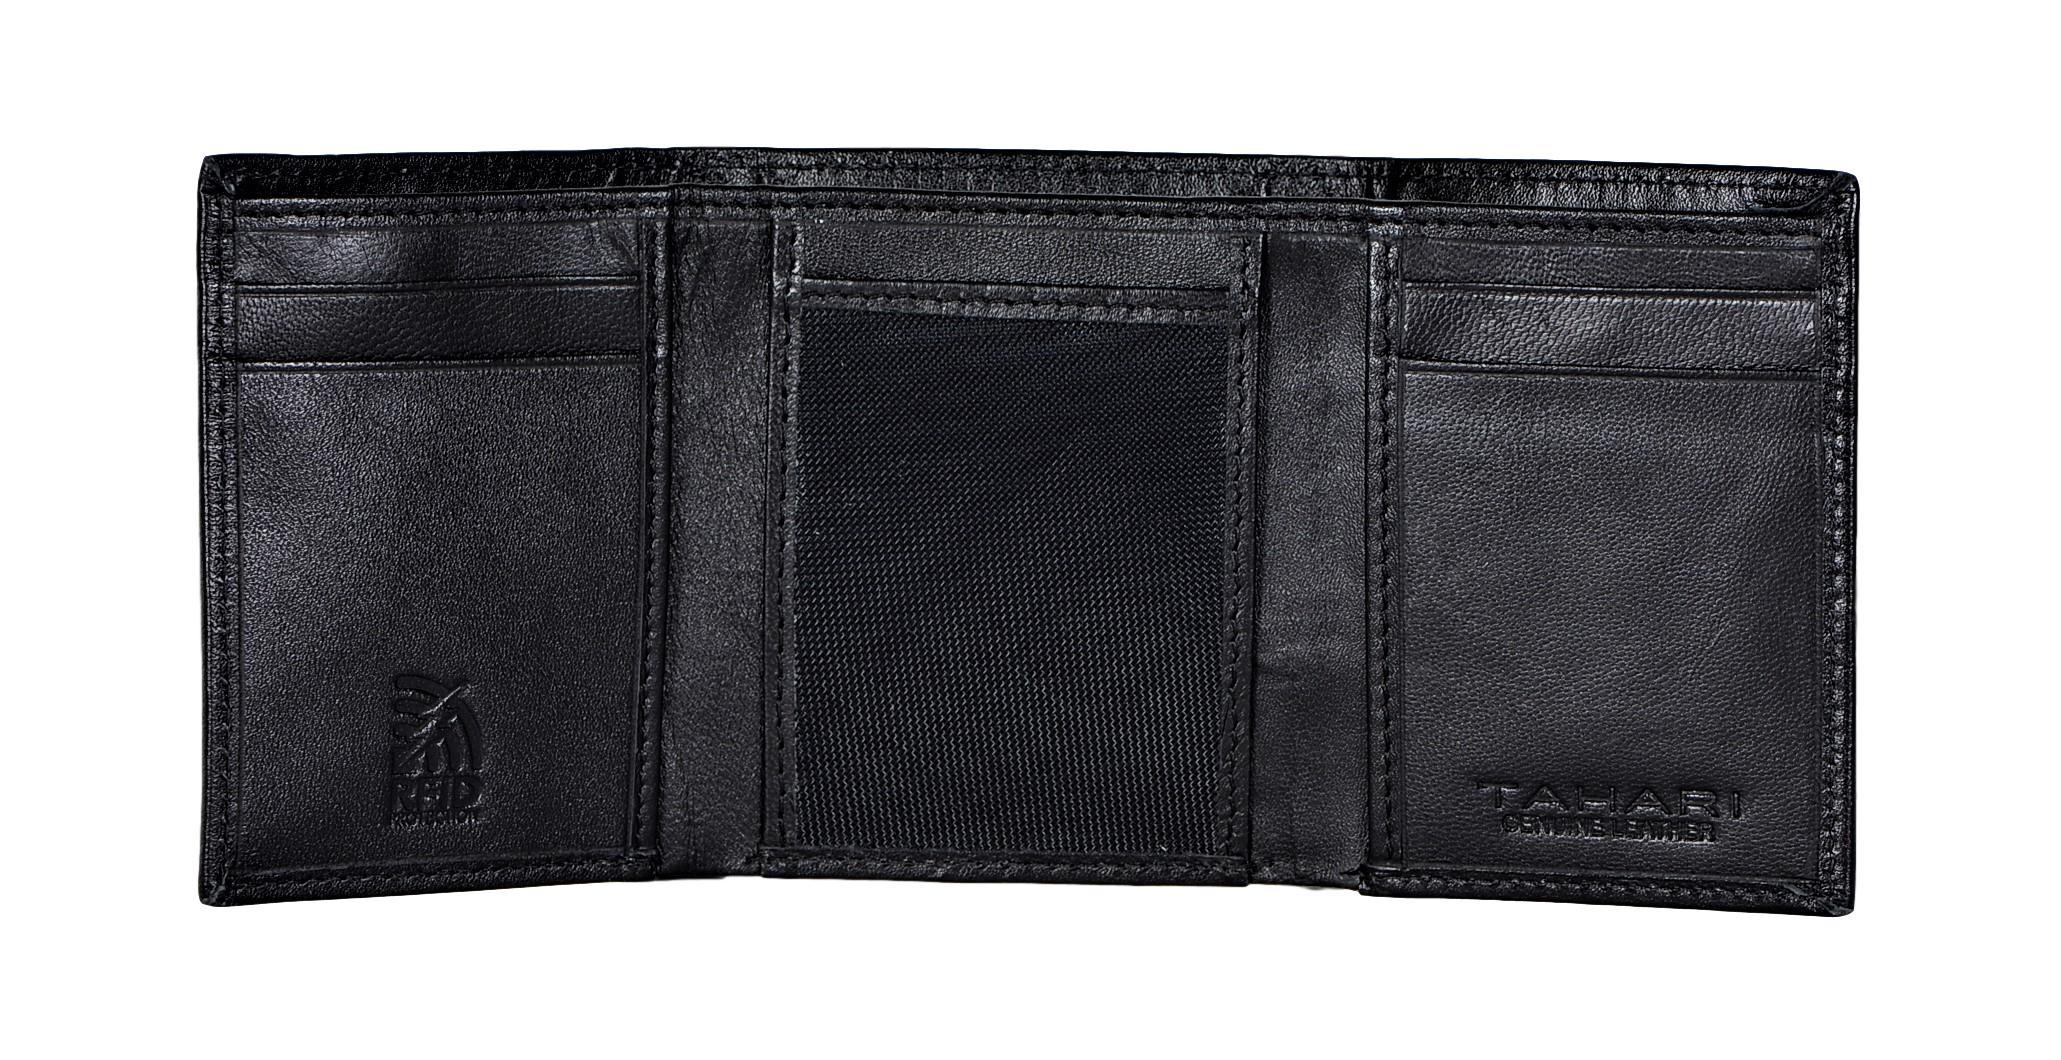 Tahari-Men-039-s-RFID-Security-Blocking-Leather-Glove-Trifold-Wallet thumbnail 9